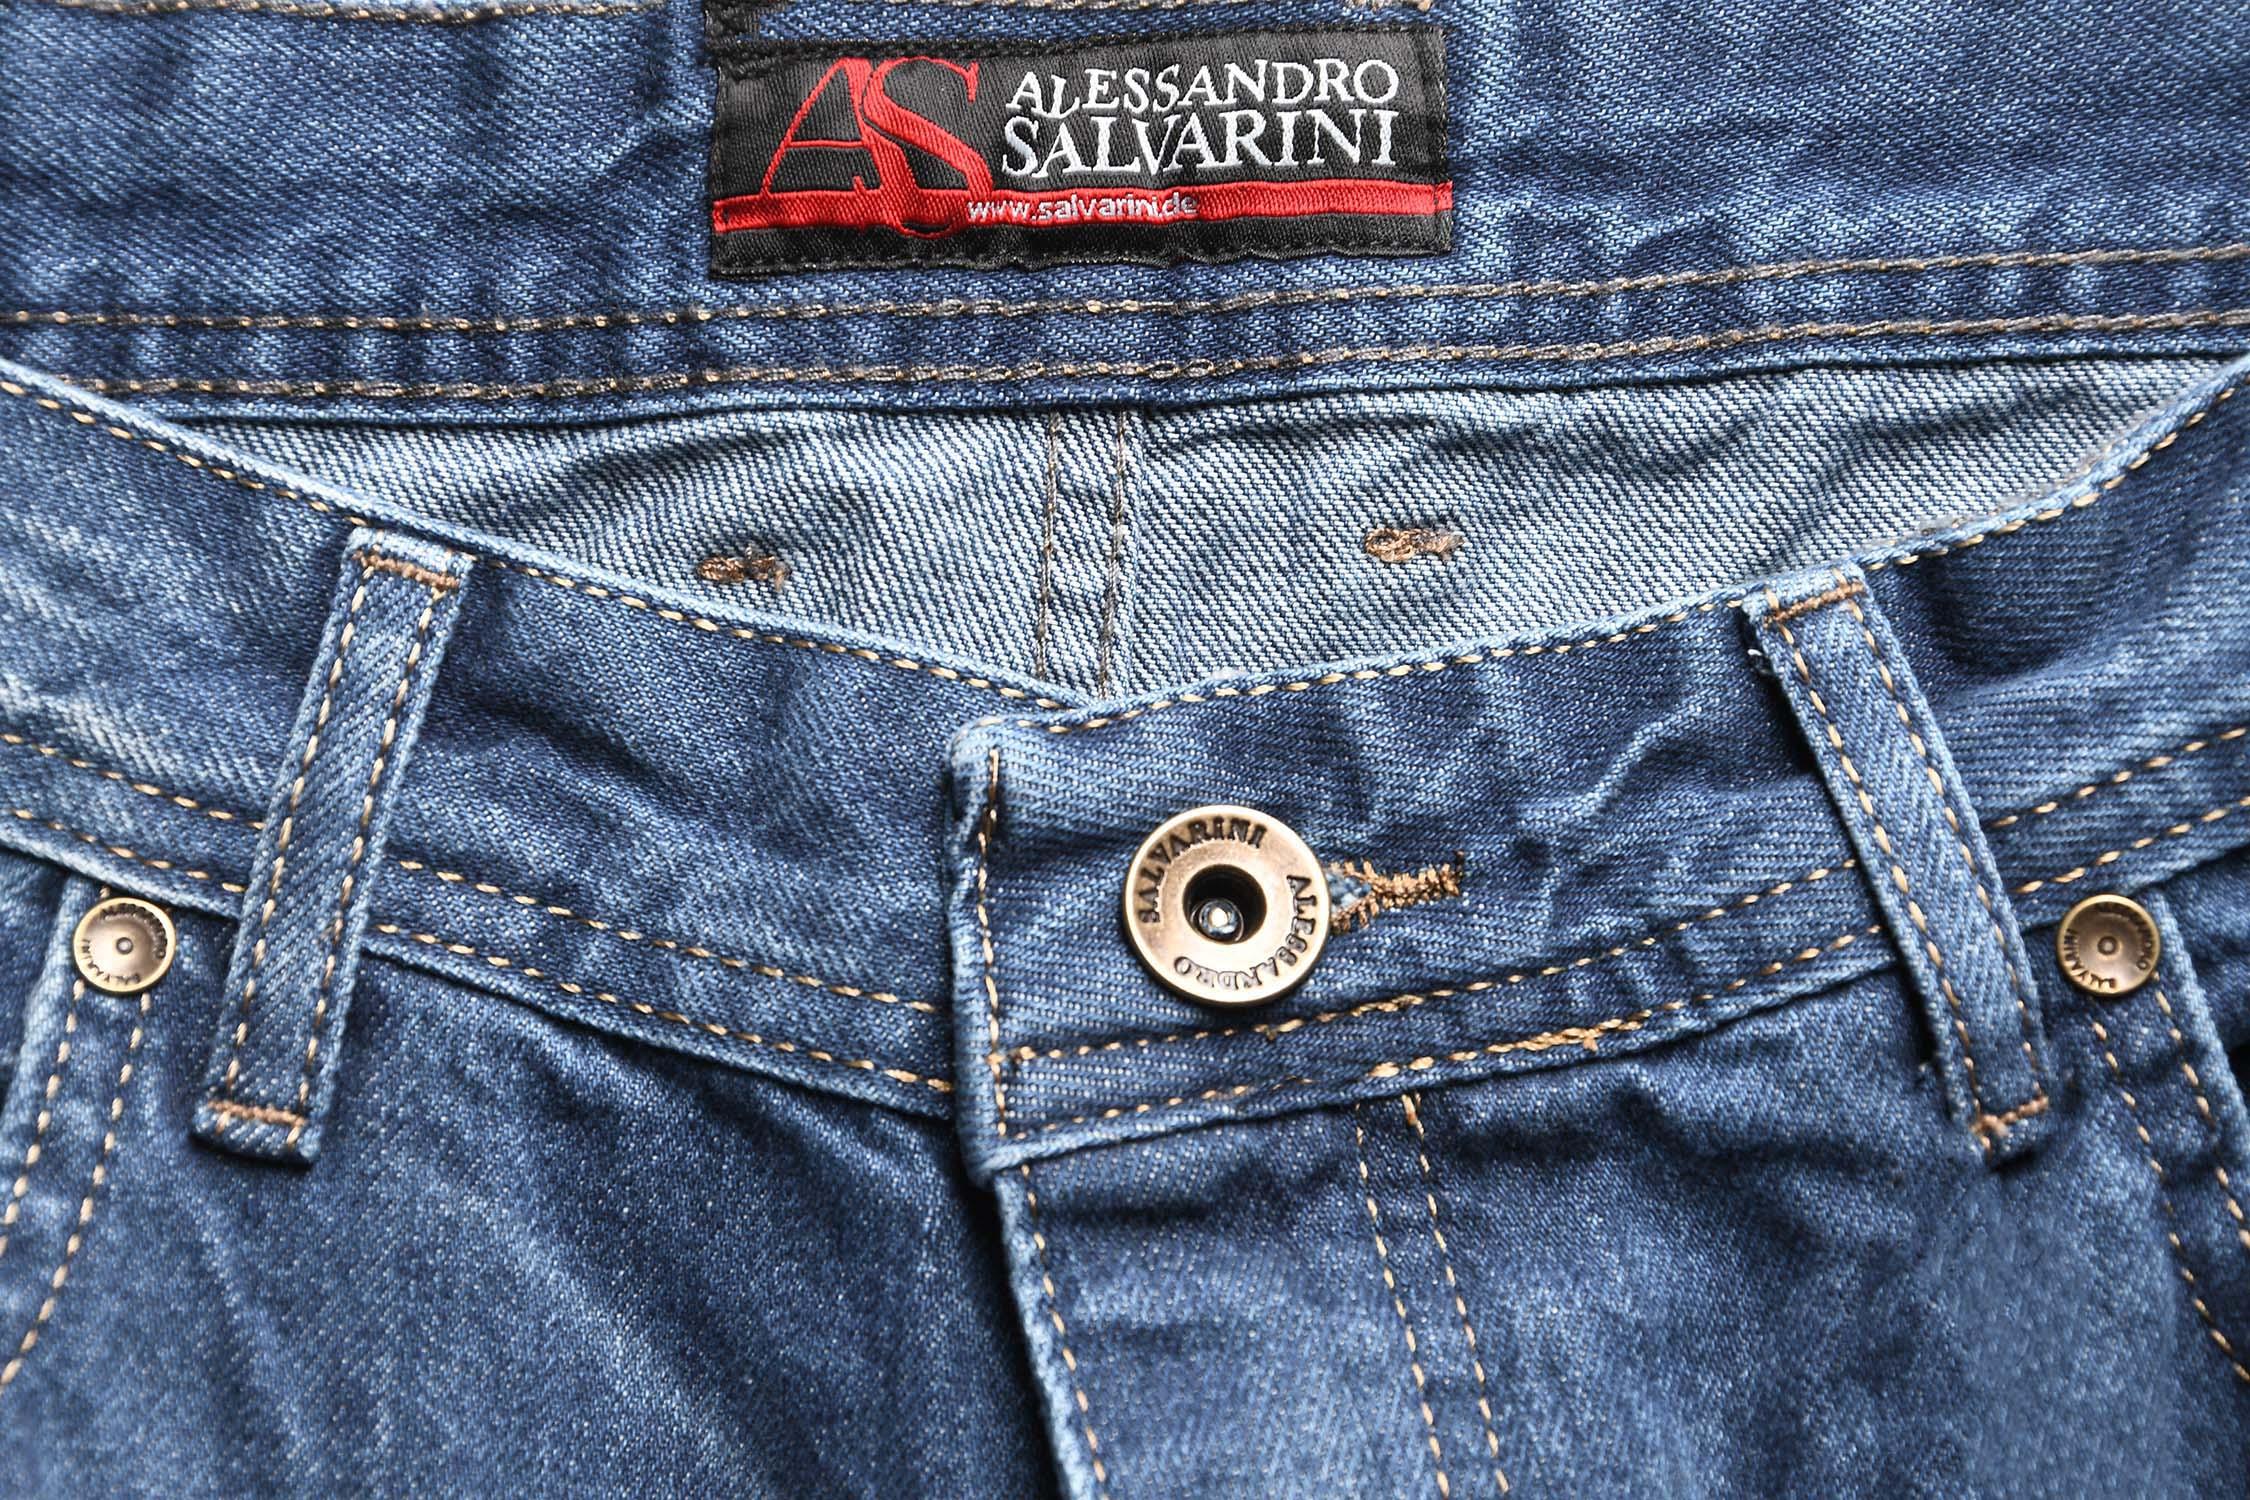 A-Salvarini-Beppo-Designer-Herren-Jeans-Hose-Basic-Jeanshose-Comfort-Fit Indexbild 8